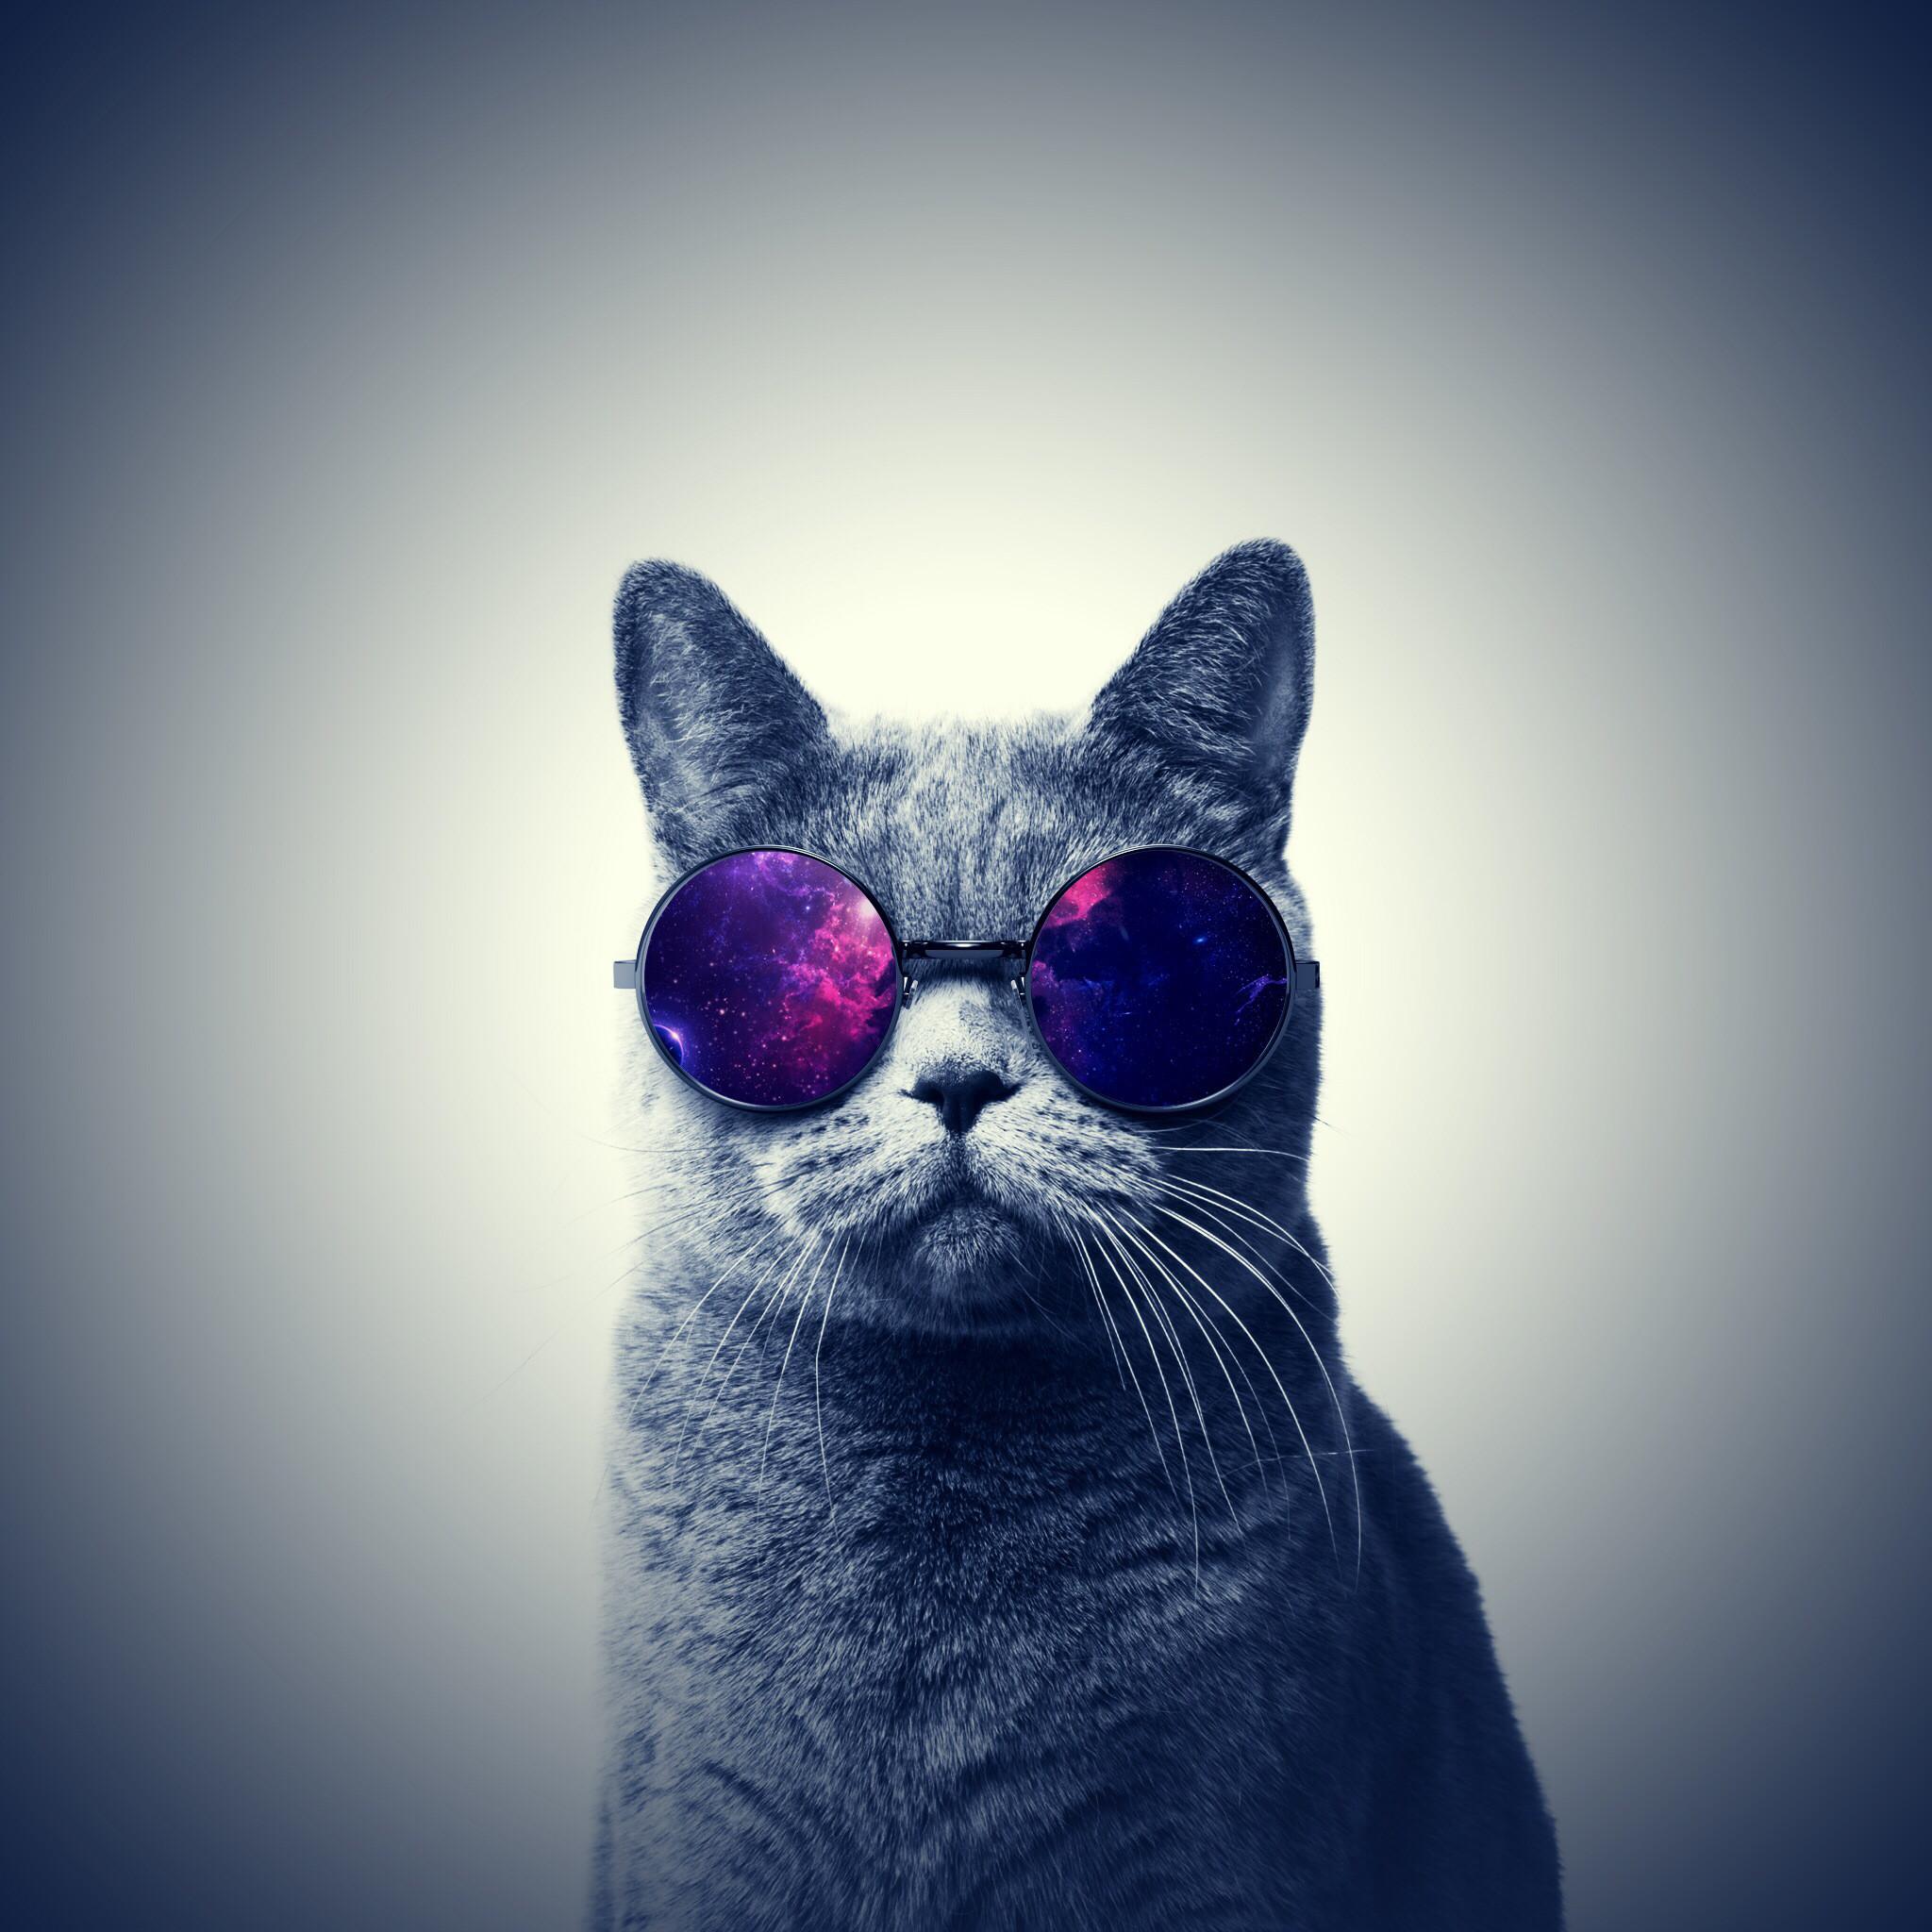 #cat#galaxy#glasses